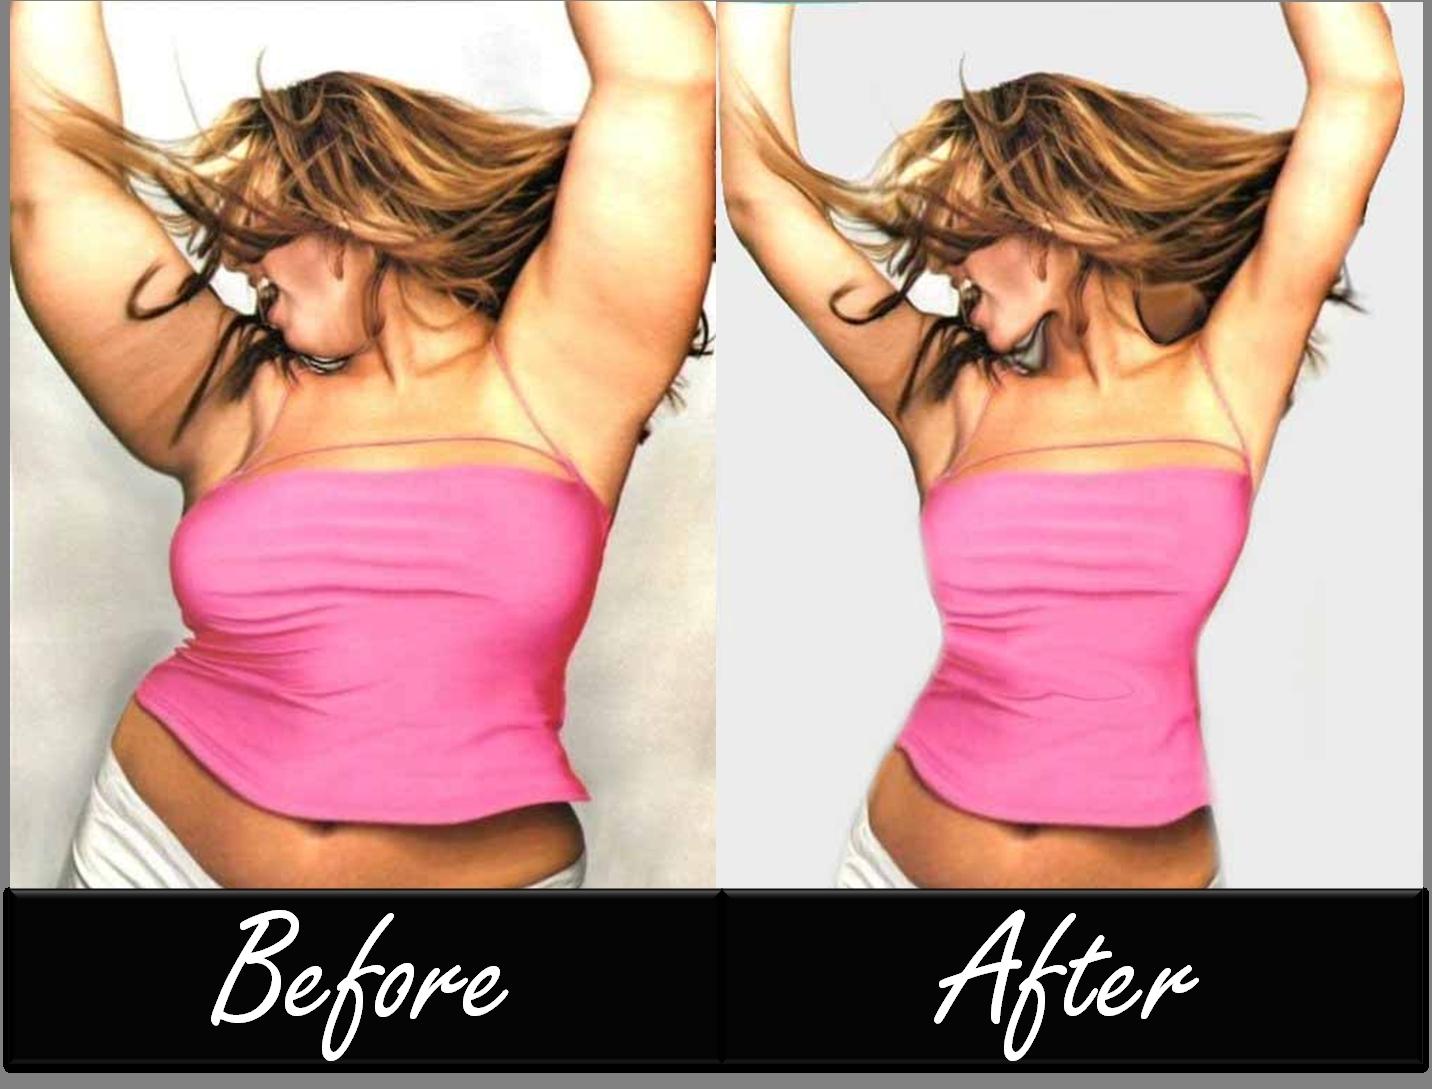 ... spots/photoshop/images/3515453/title/extreme-photoshop-makeover-photo